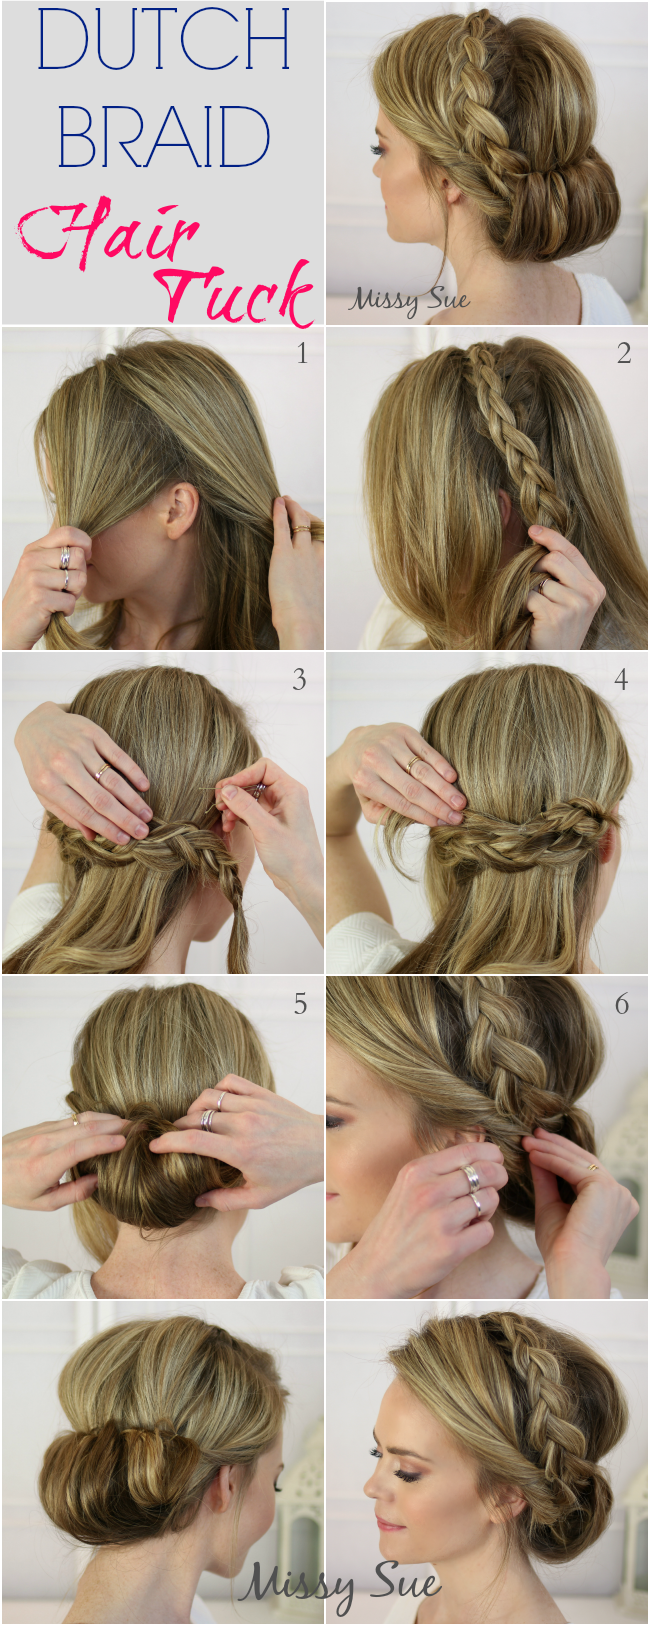 Dutch Headband Hair Tuck  MissySuecom  Womenus World  Pinterest